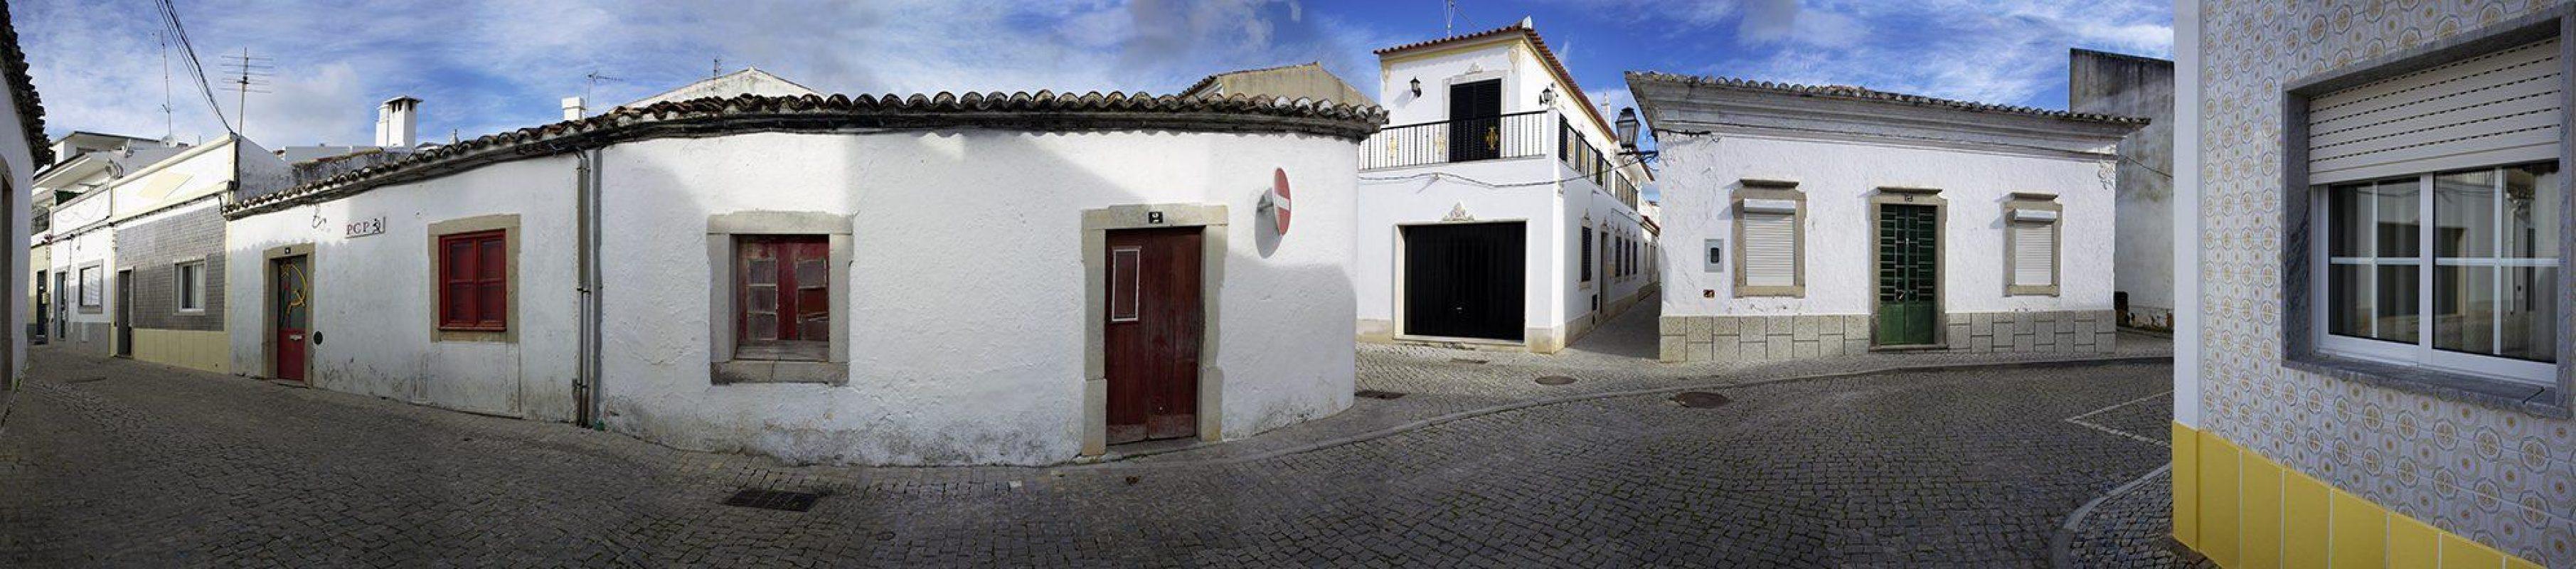 Portugal, Fuseta, Partei CP 2